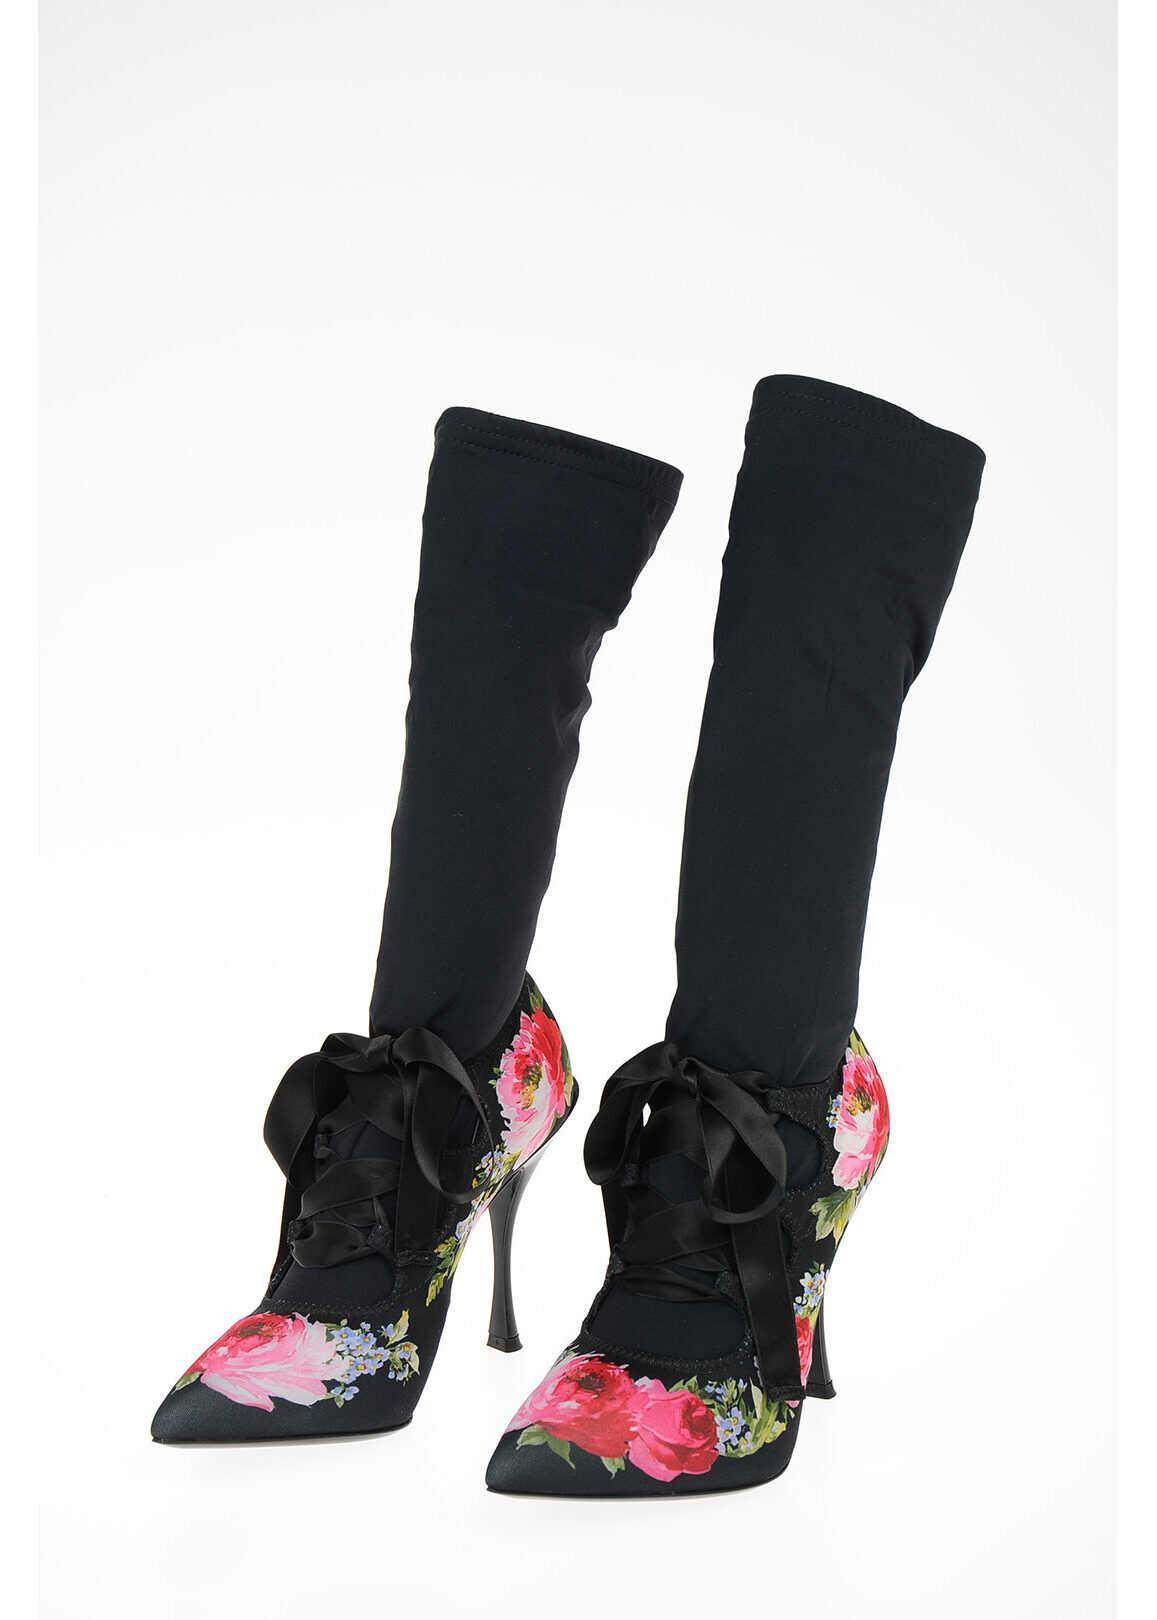 Dolce & Gabbana Floral Printed LORI Sock Boots 12 cm BLACK